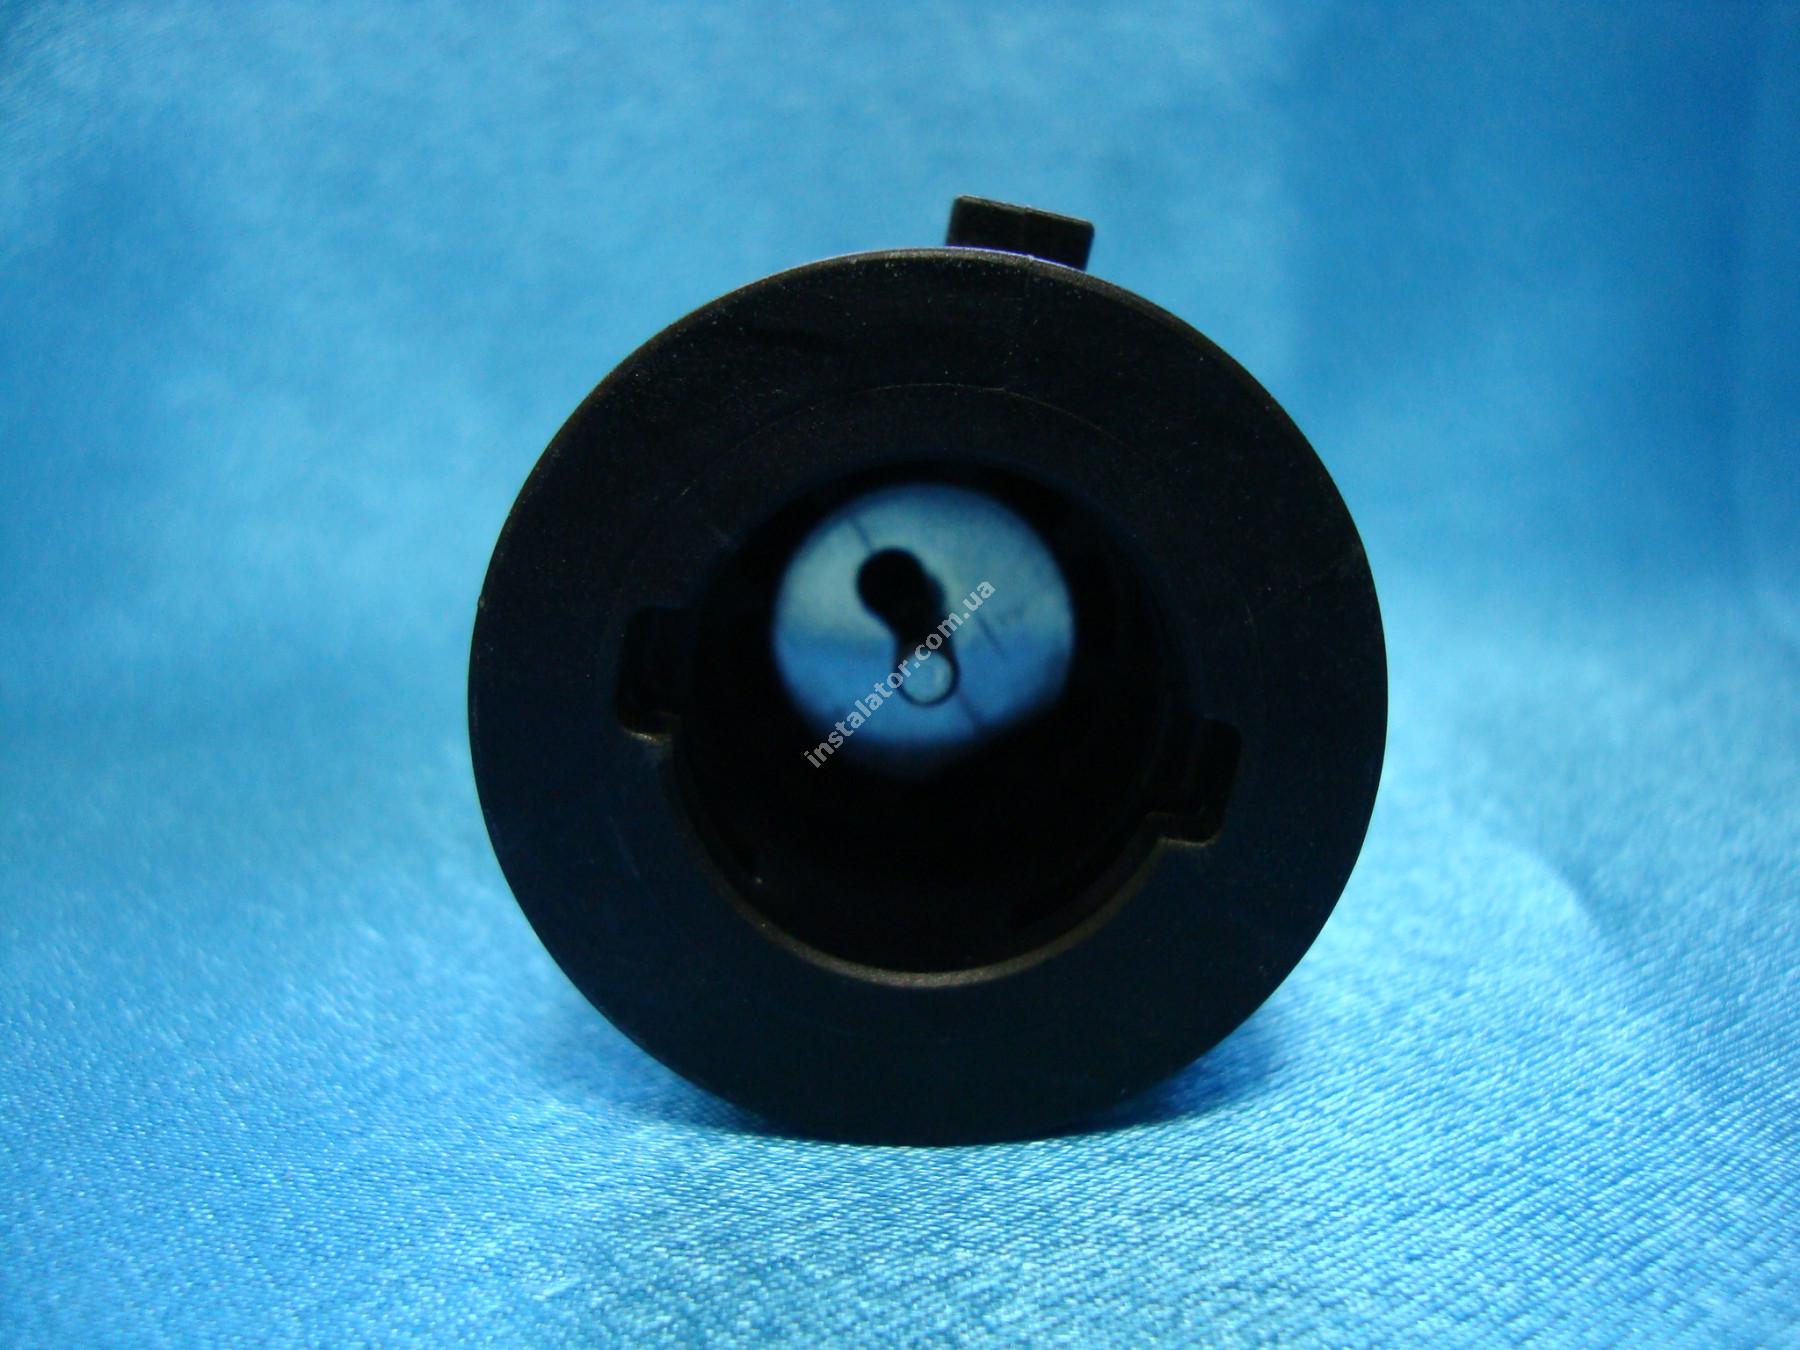 721403800 Картридж 3-х ходового клапана котла Baxi ECO full-image-2